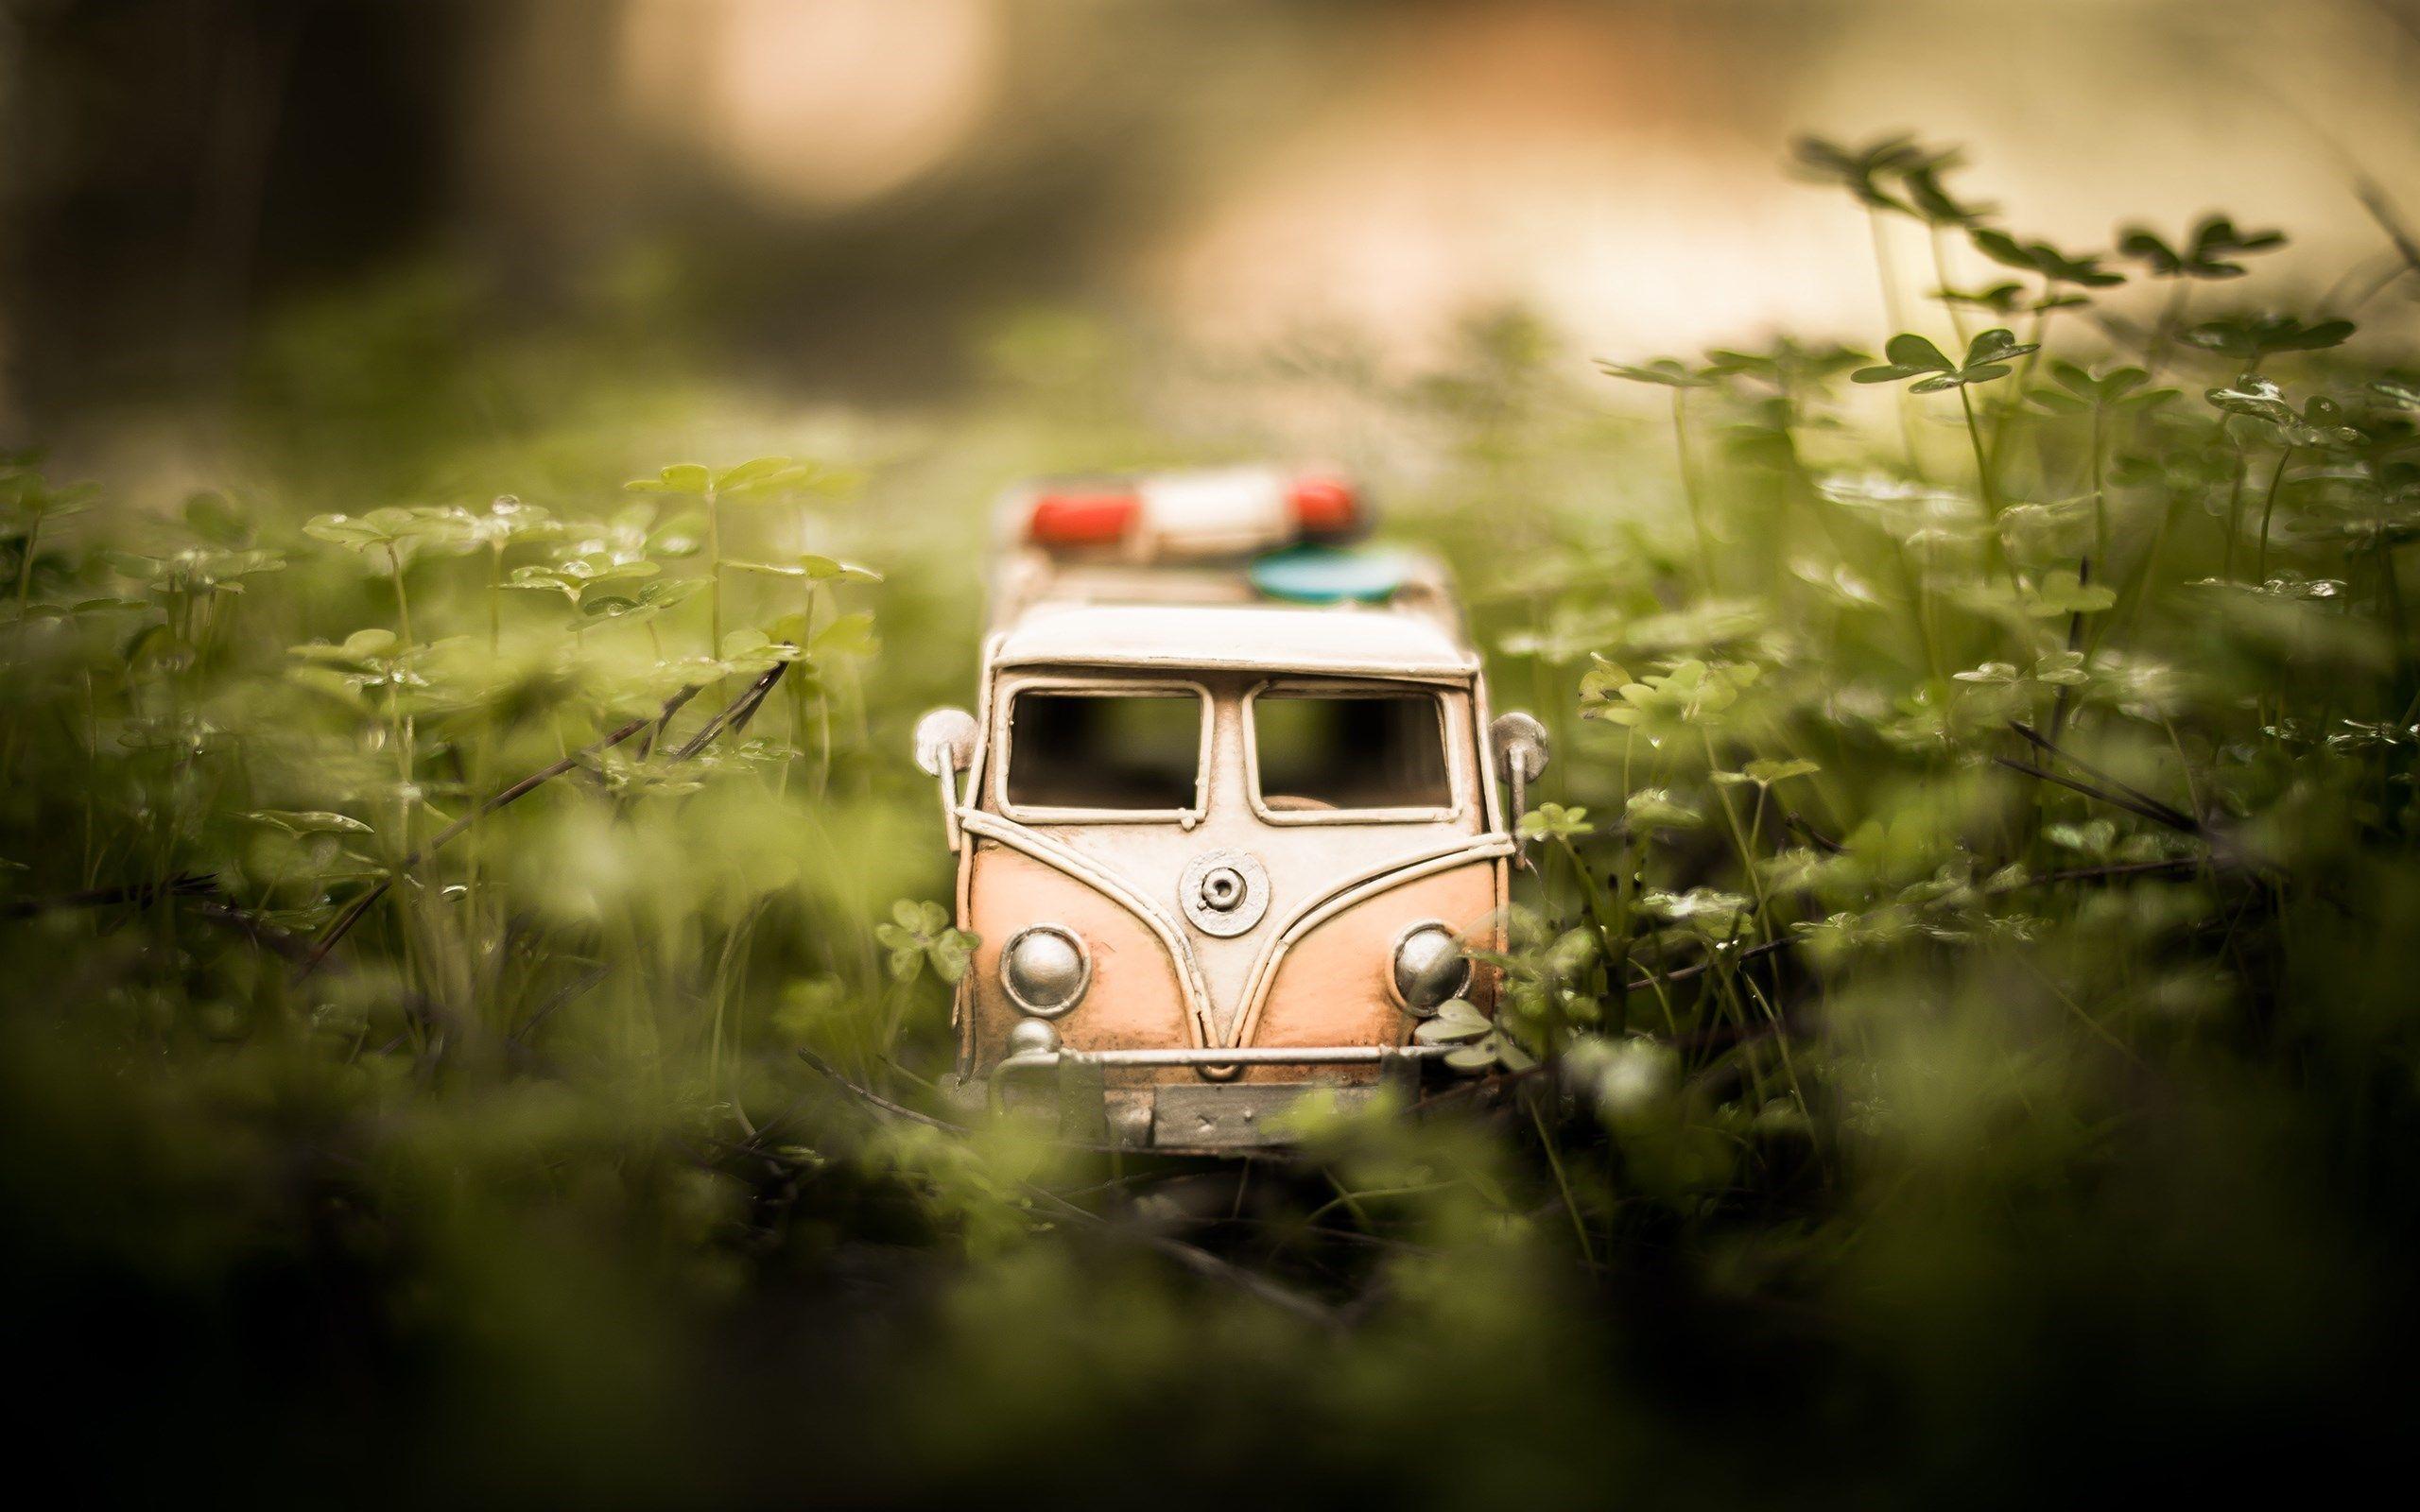 Mood Car Toy Volkswagen Bus Hd Wallpaper Zoomwalls Toy Car Disney Cars Wallpaper Car Backgrounds